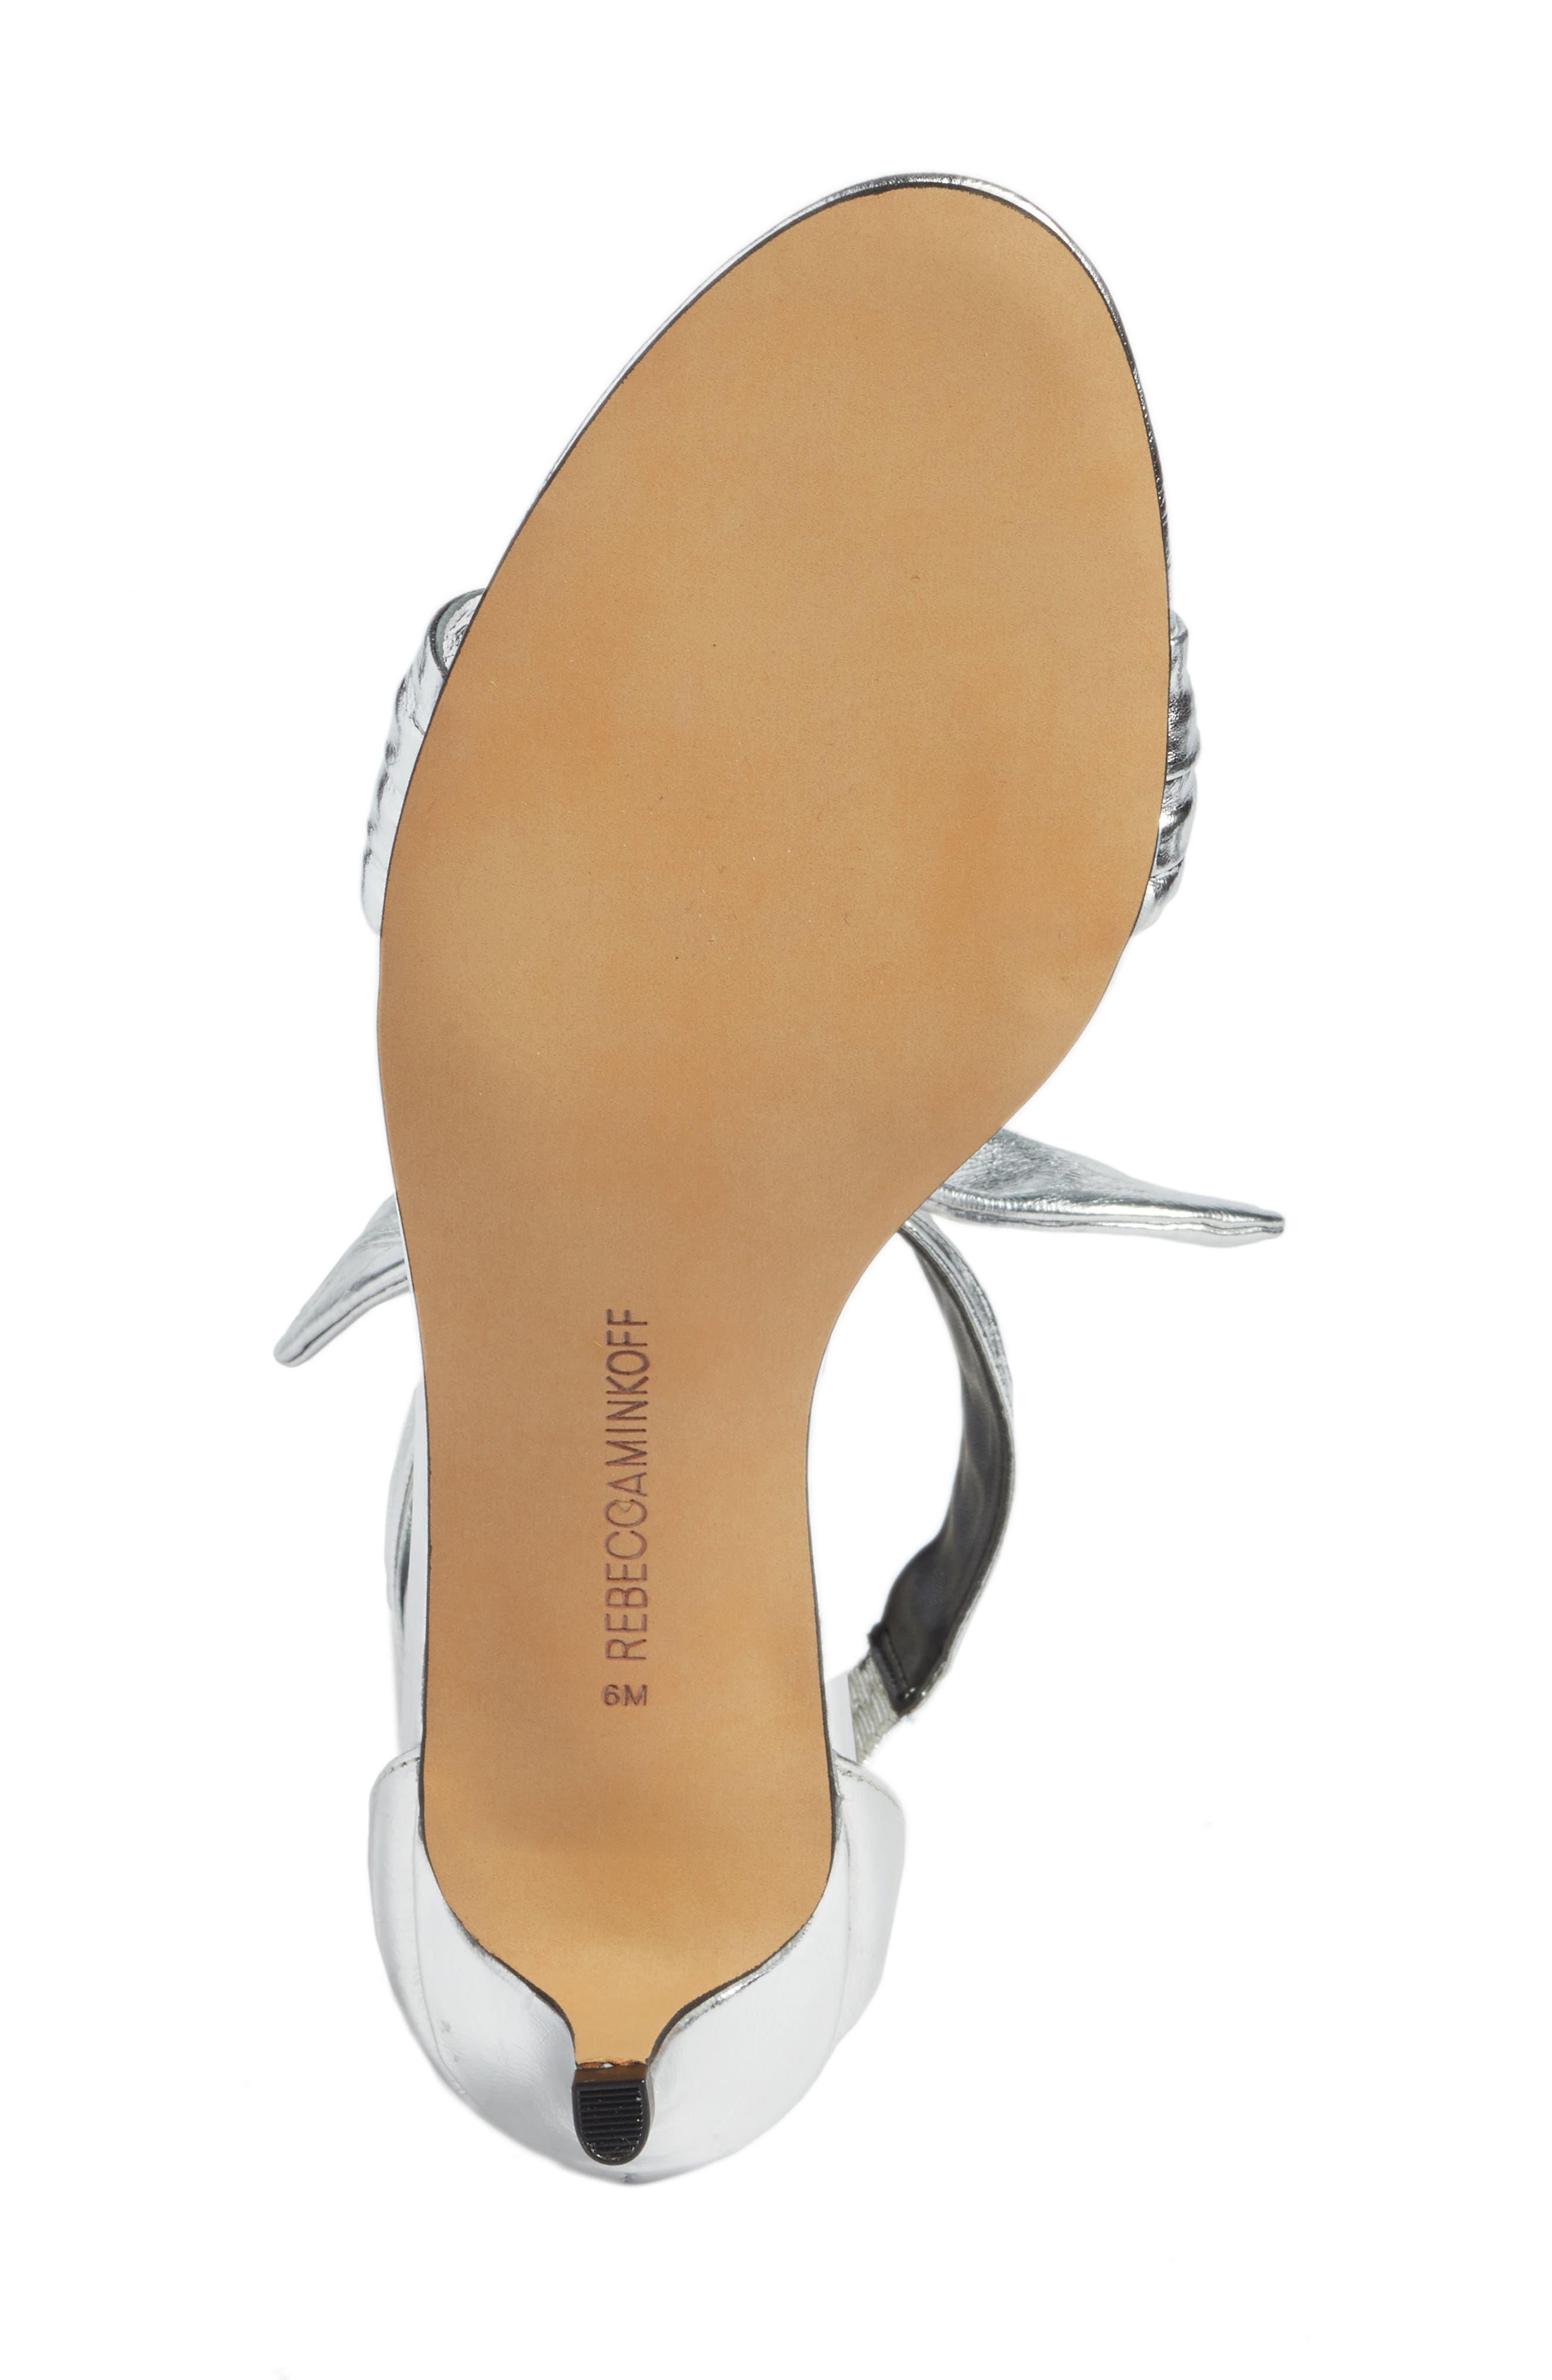 Kaley Knotted Kitten Heel Sandal,                             Alternate thumbnail 6, color,                             Silver Metallic Leather